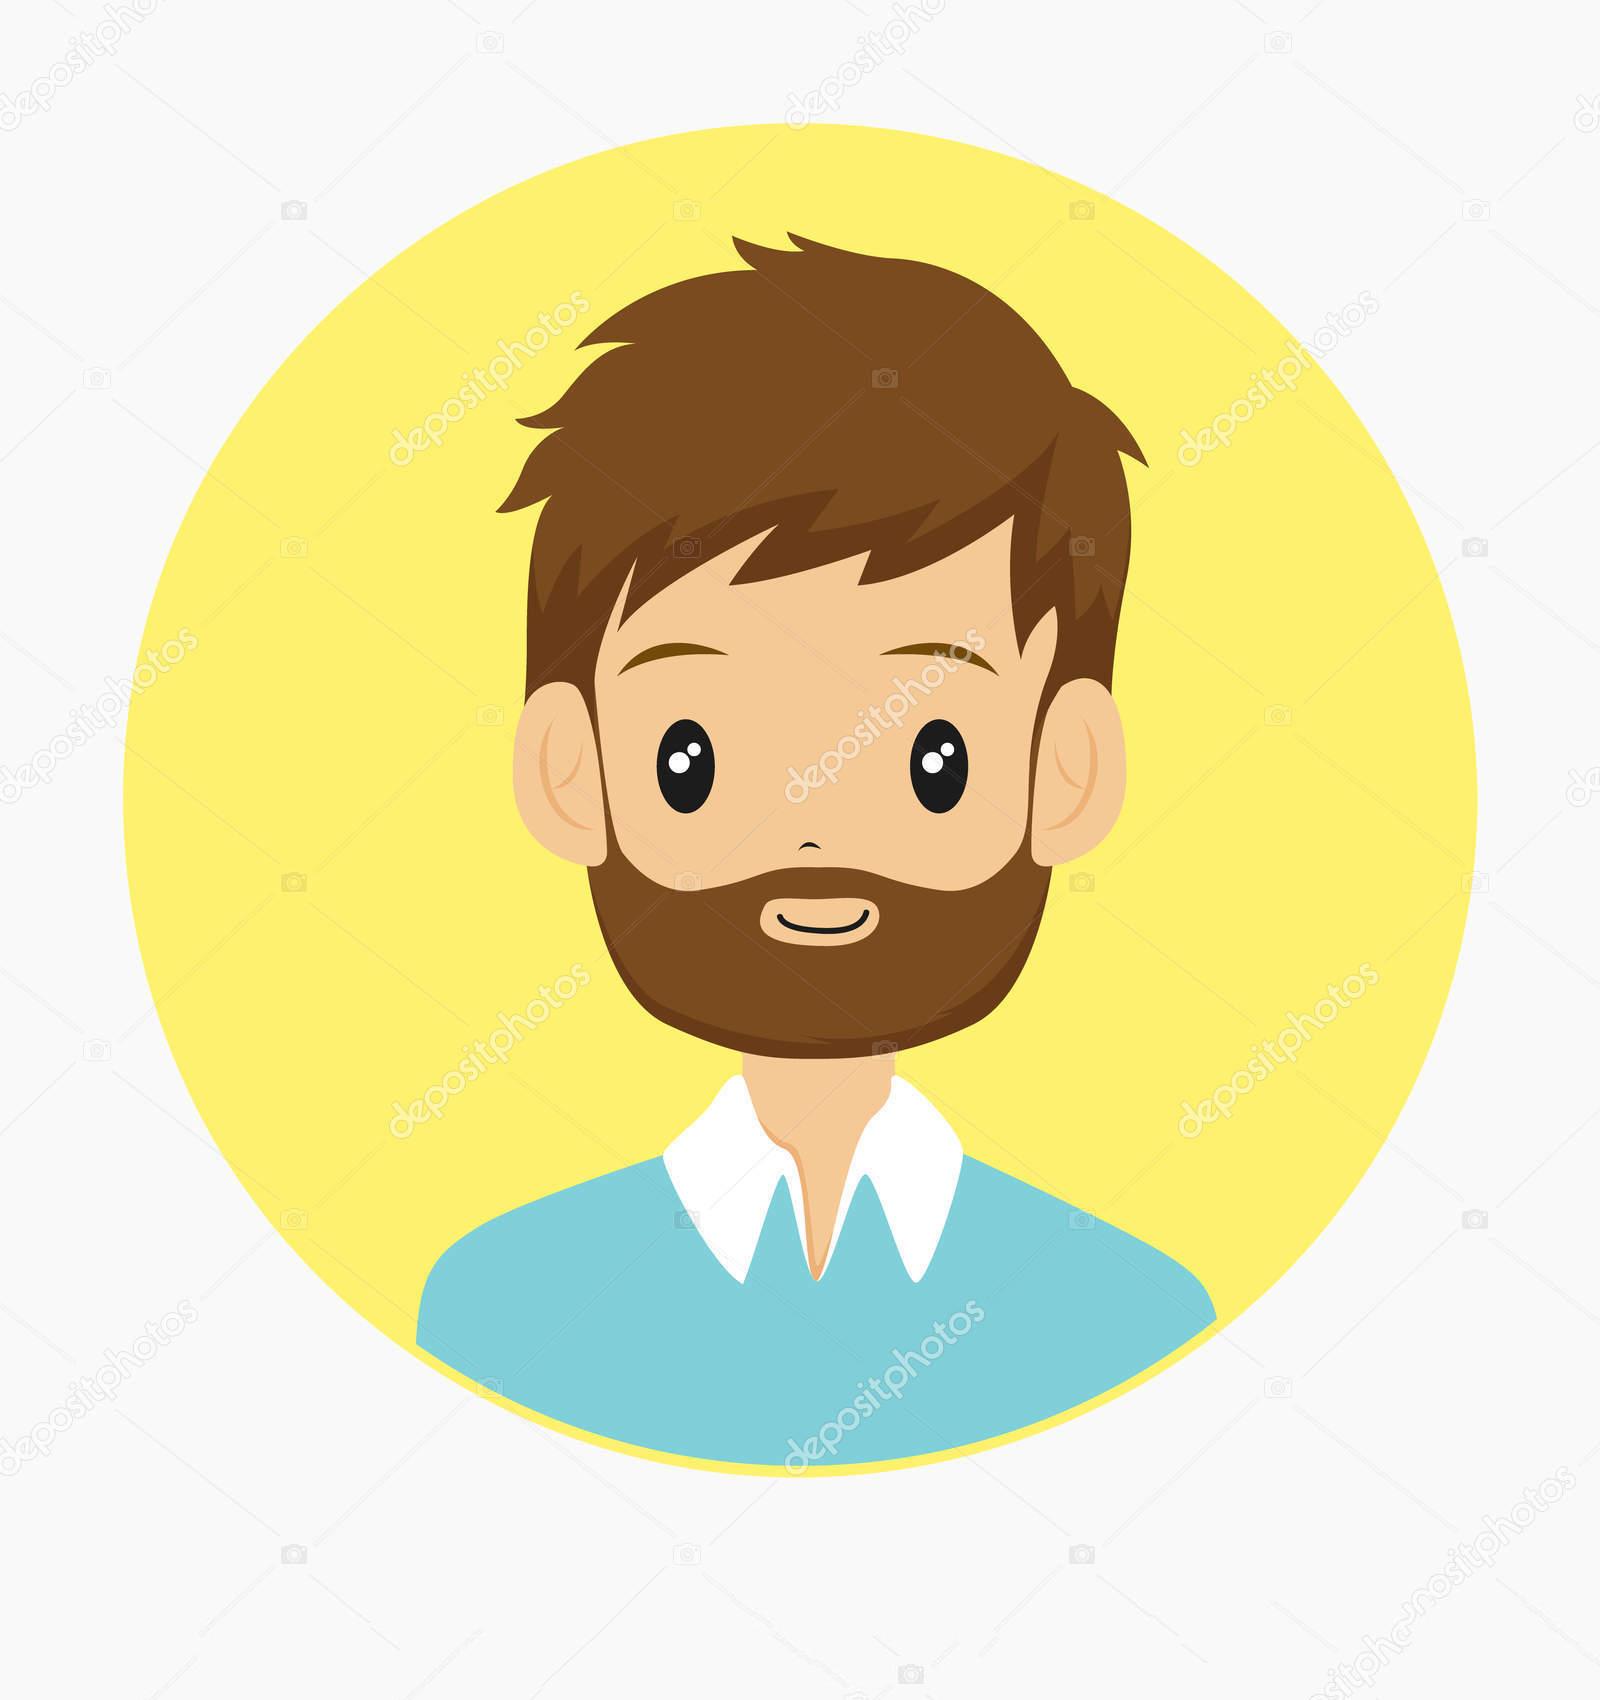 depositphotos_164456604-stock-illustration-half-body-father-avatar-vector.png